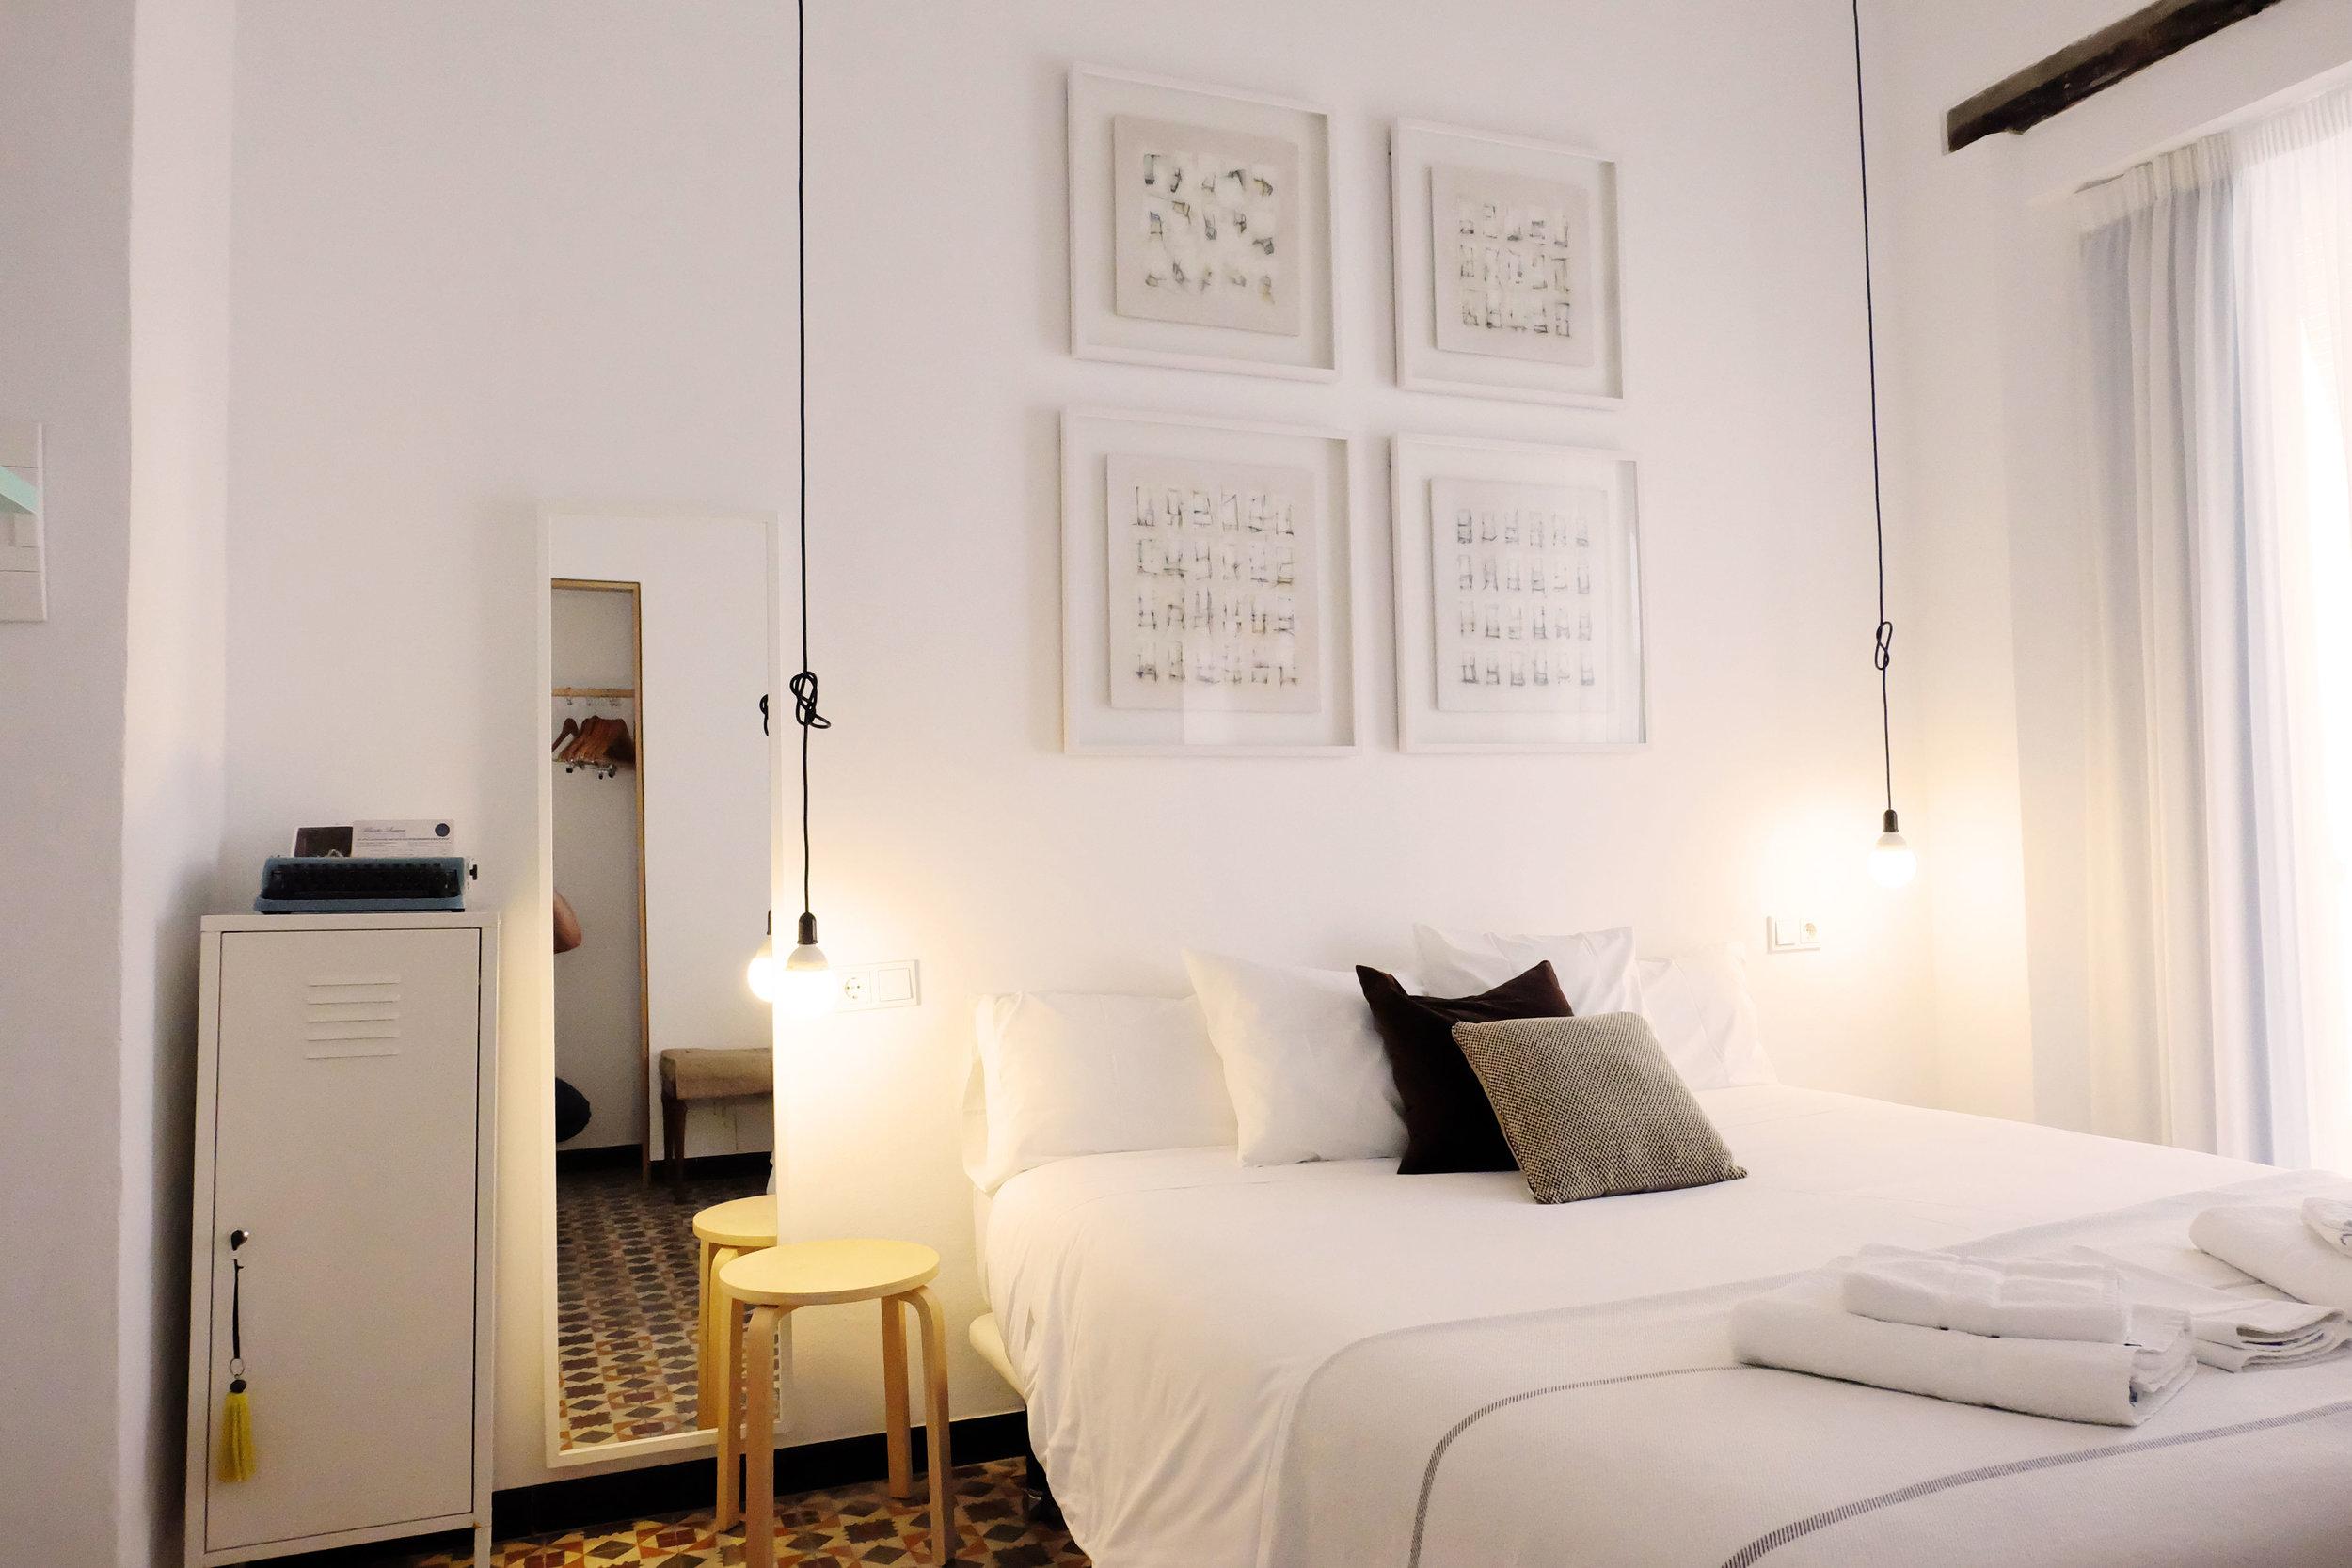 Hotel-Casa-de-huespedes-santa-maria-Habitacion-8-9.JPG